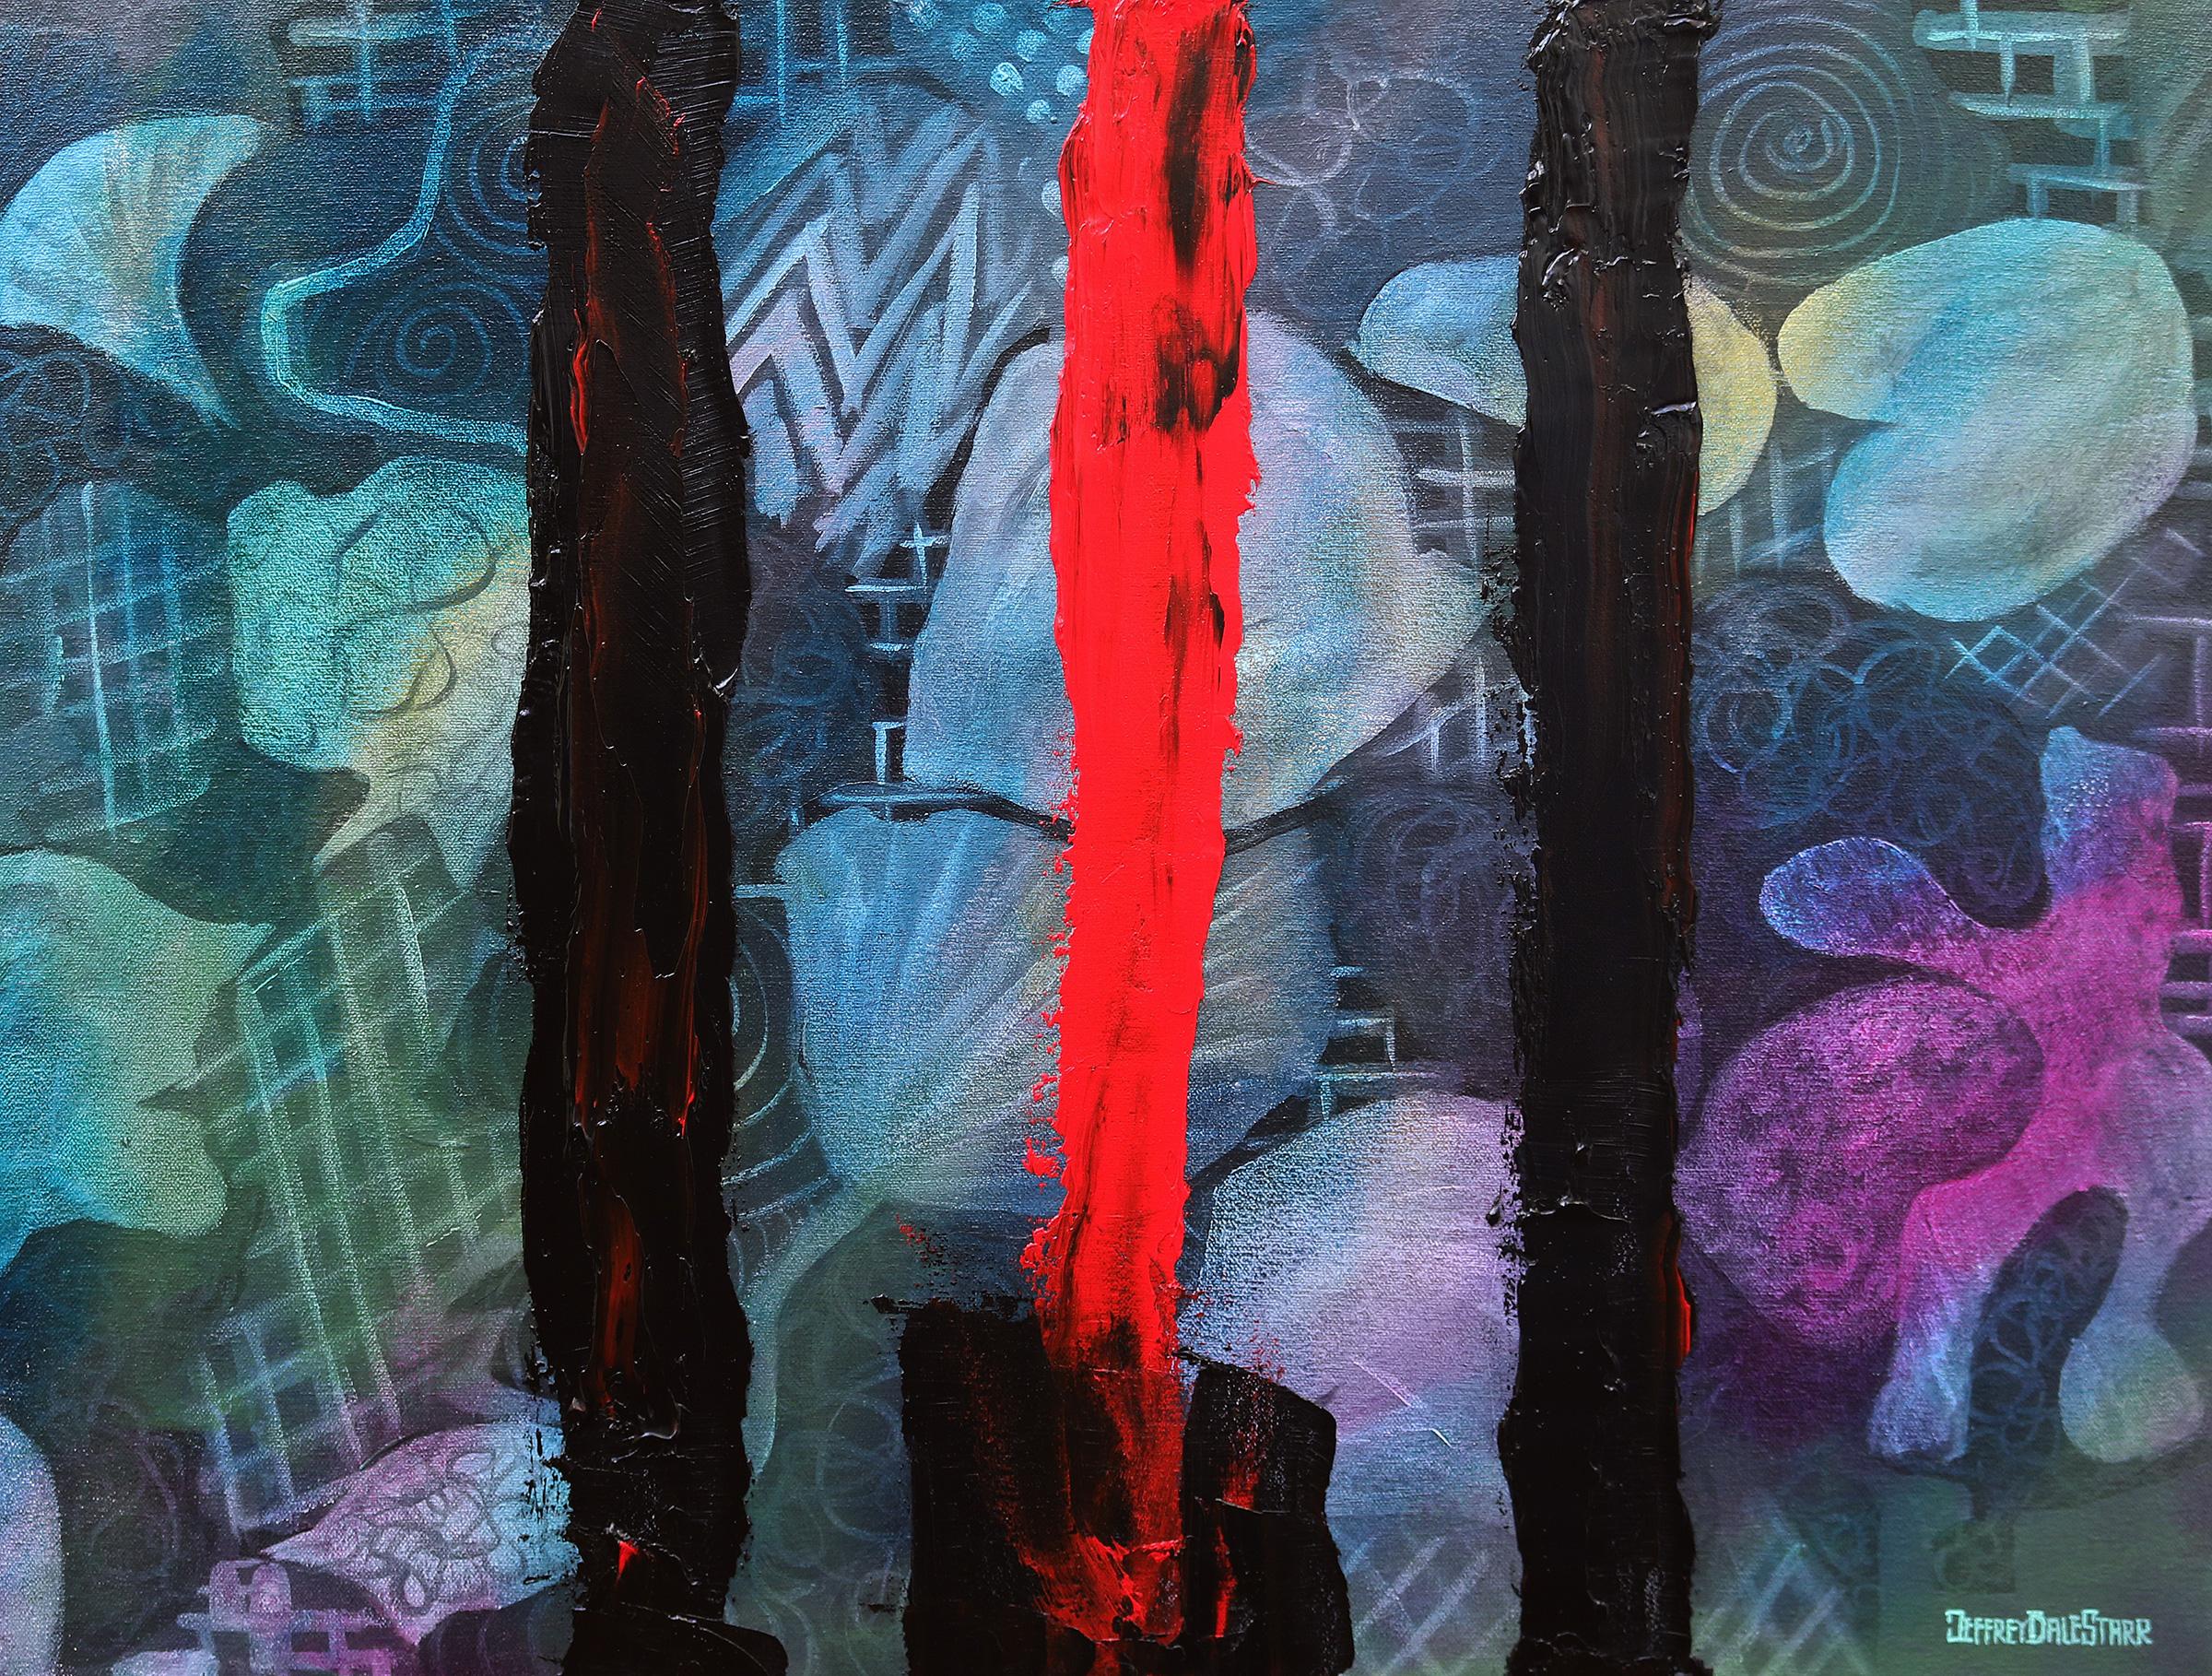 oil painting of muse hysteria matt bellamy by american artist jeffrey dale starr